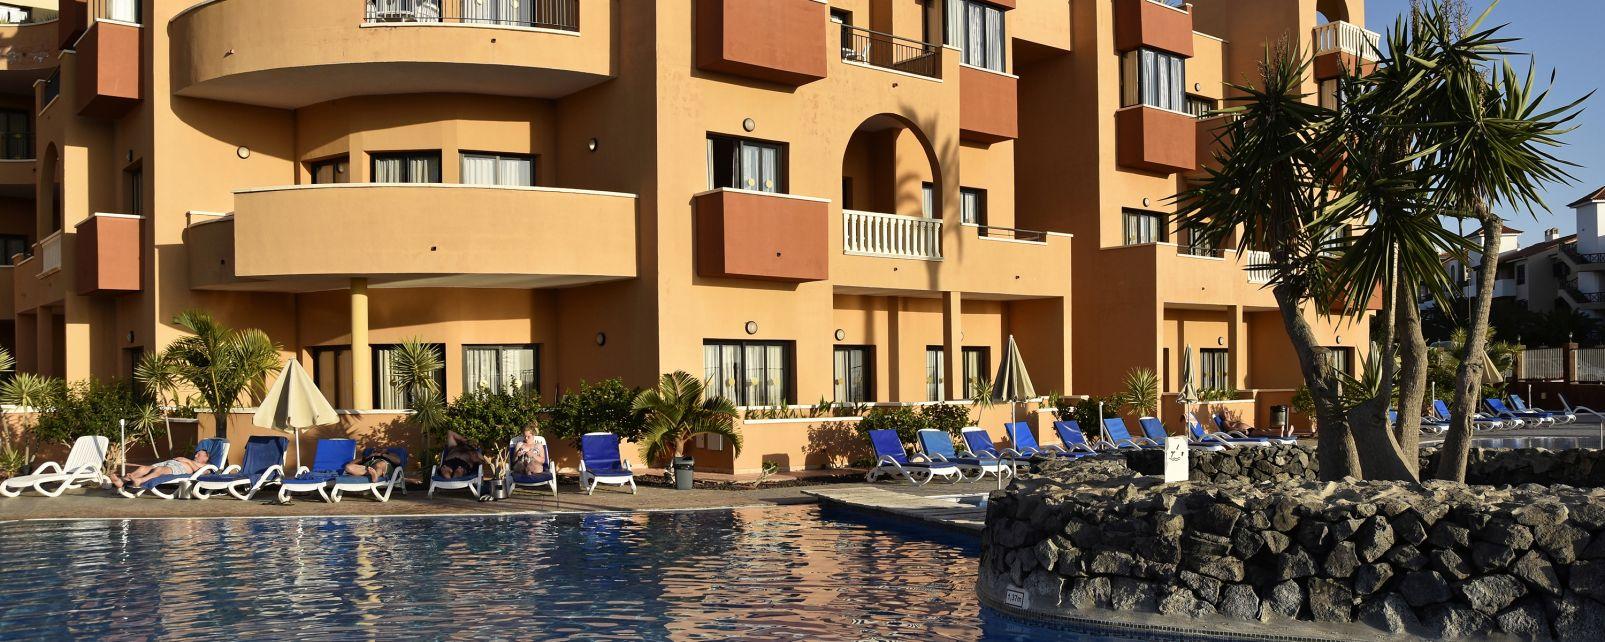 Hôtel Grand Muthu Golf Plaza Hotel & Spa